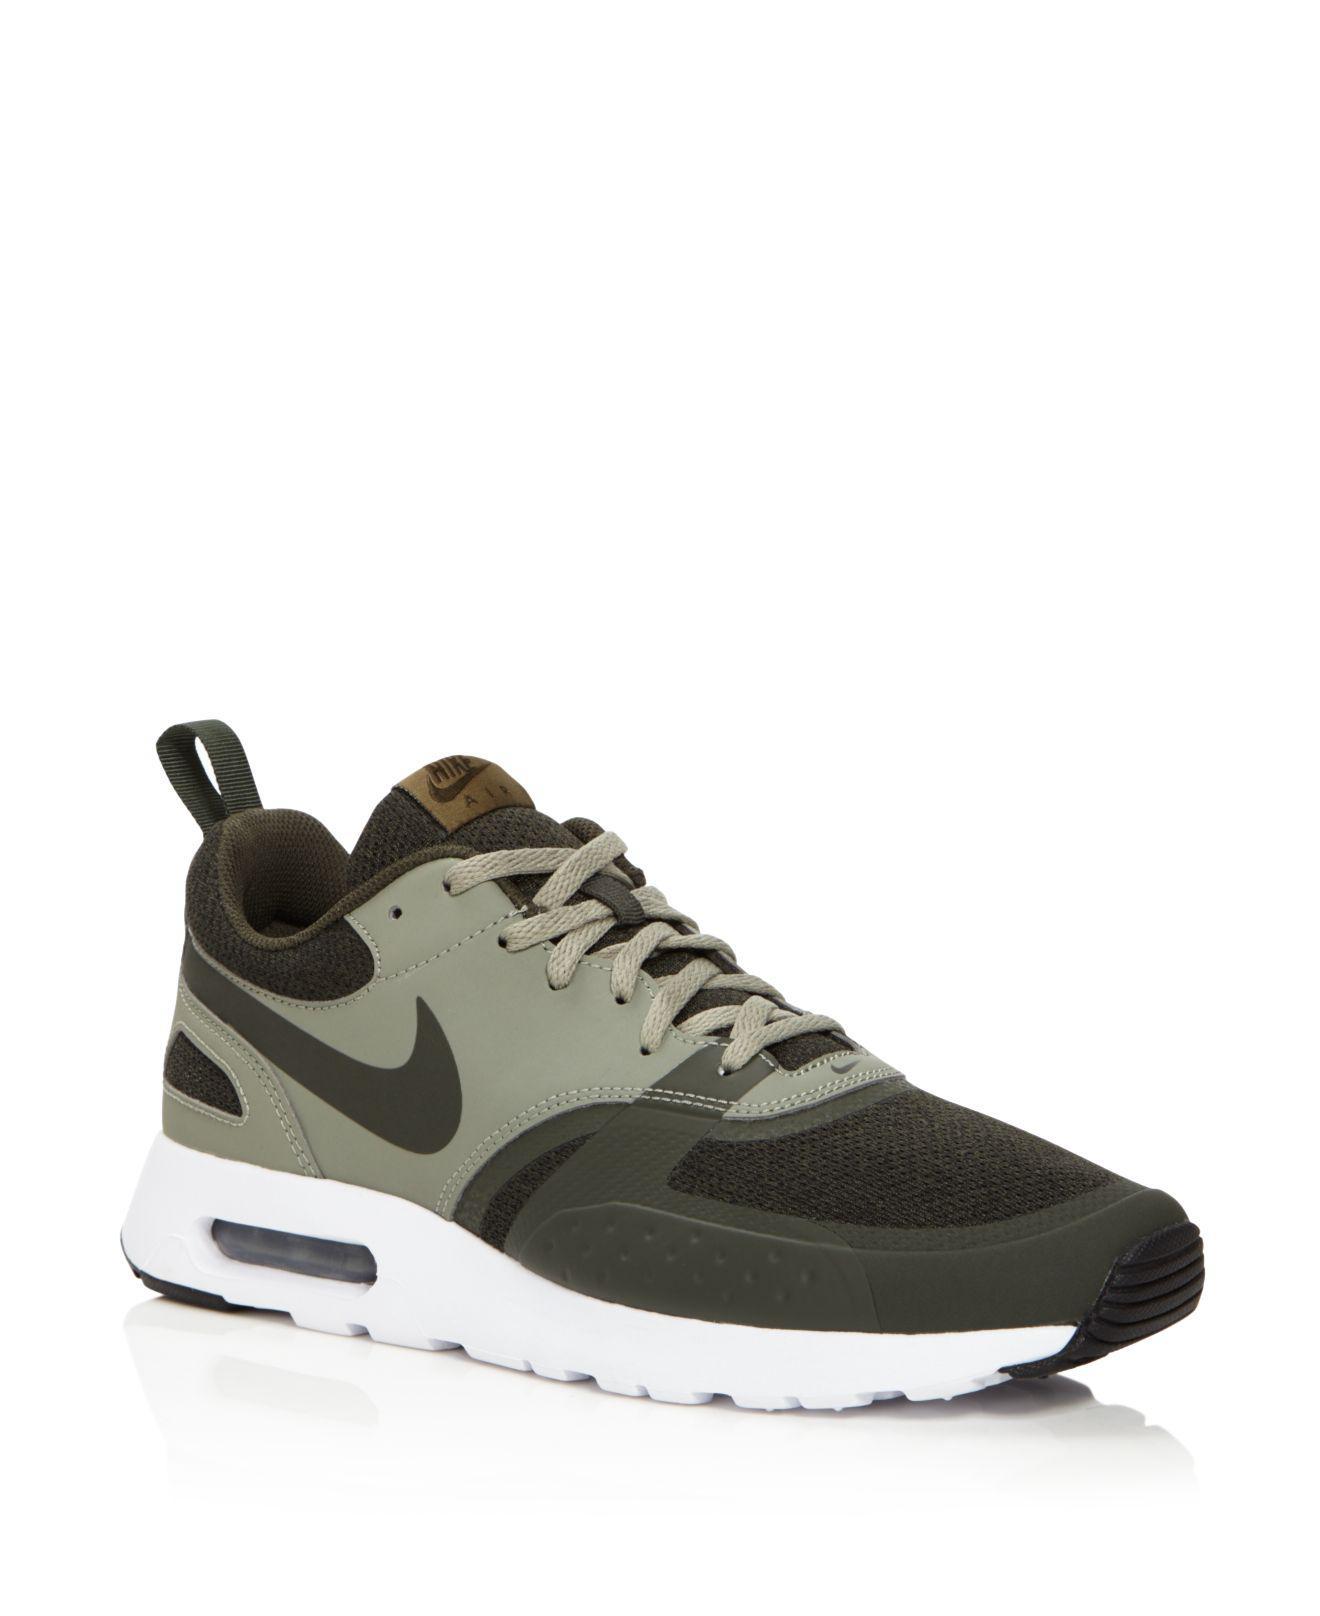 Nike Air Max Vision Se Low Top Sneakers in Green for Men - Lyst